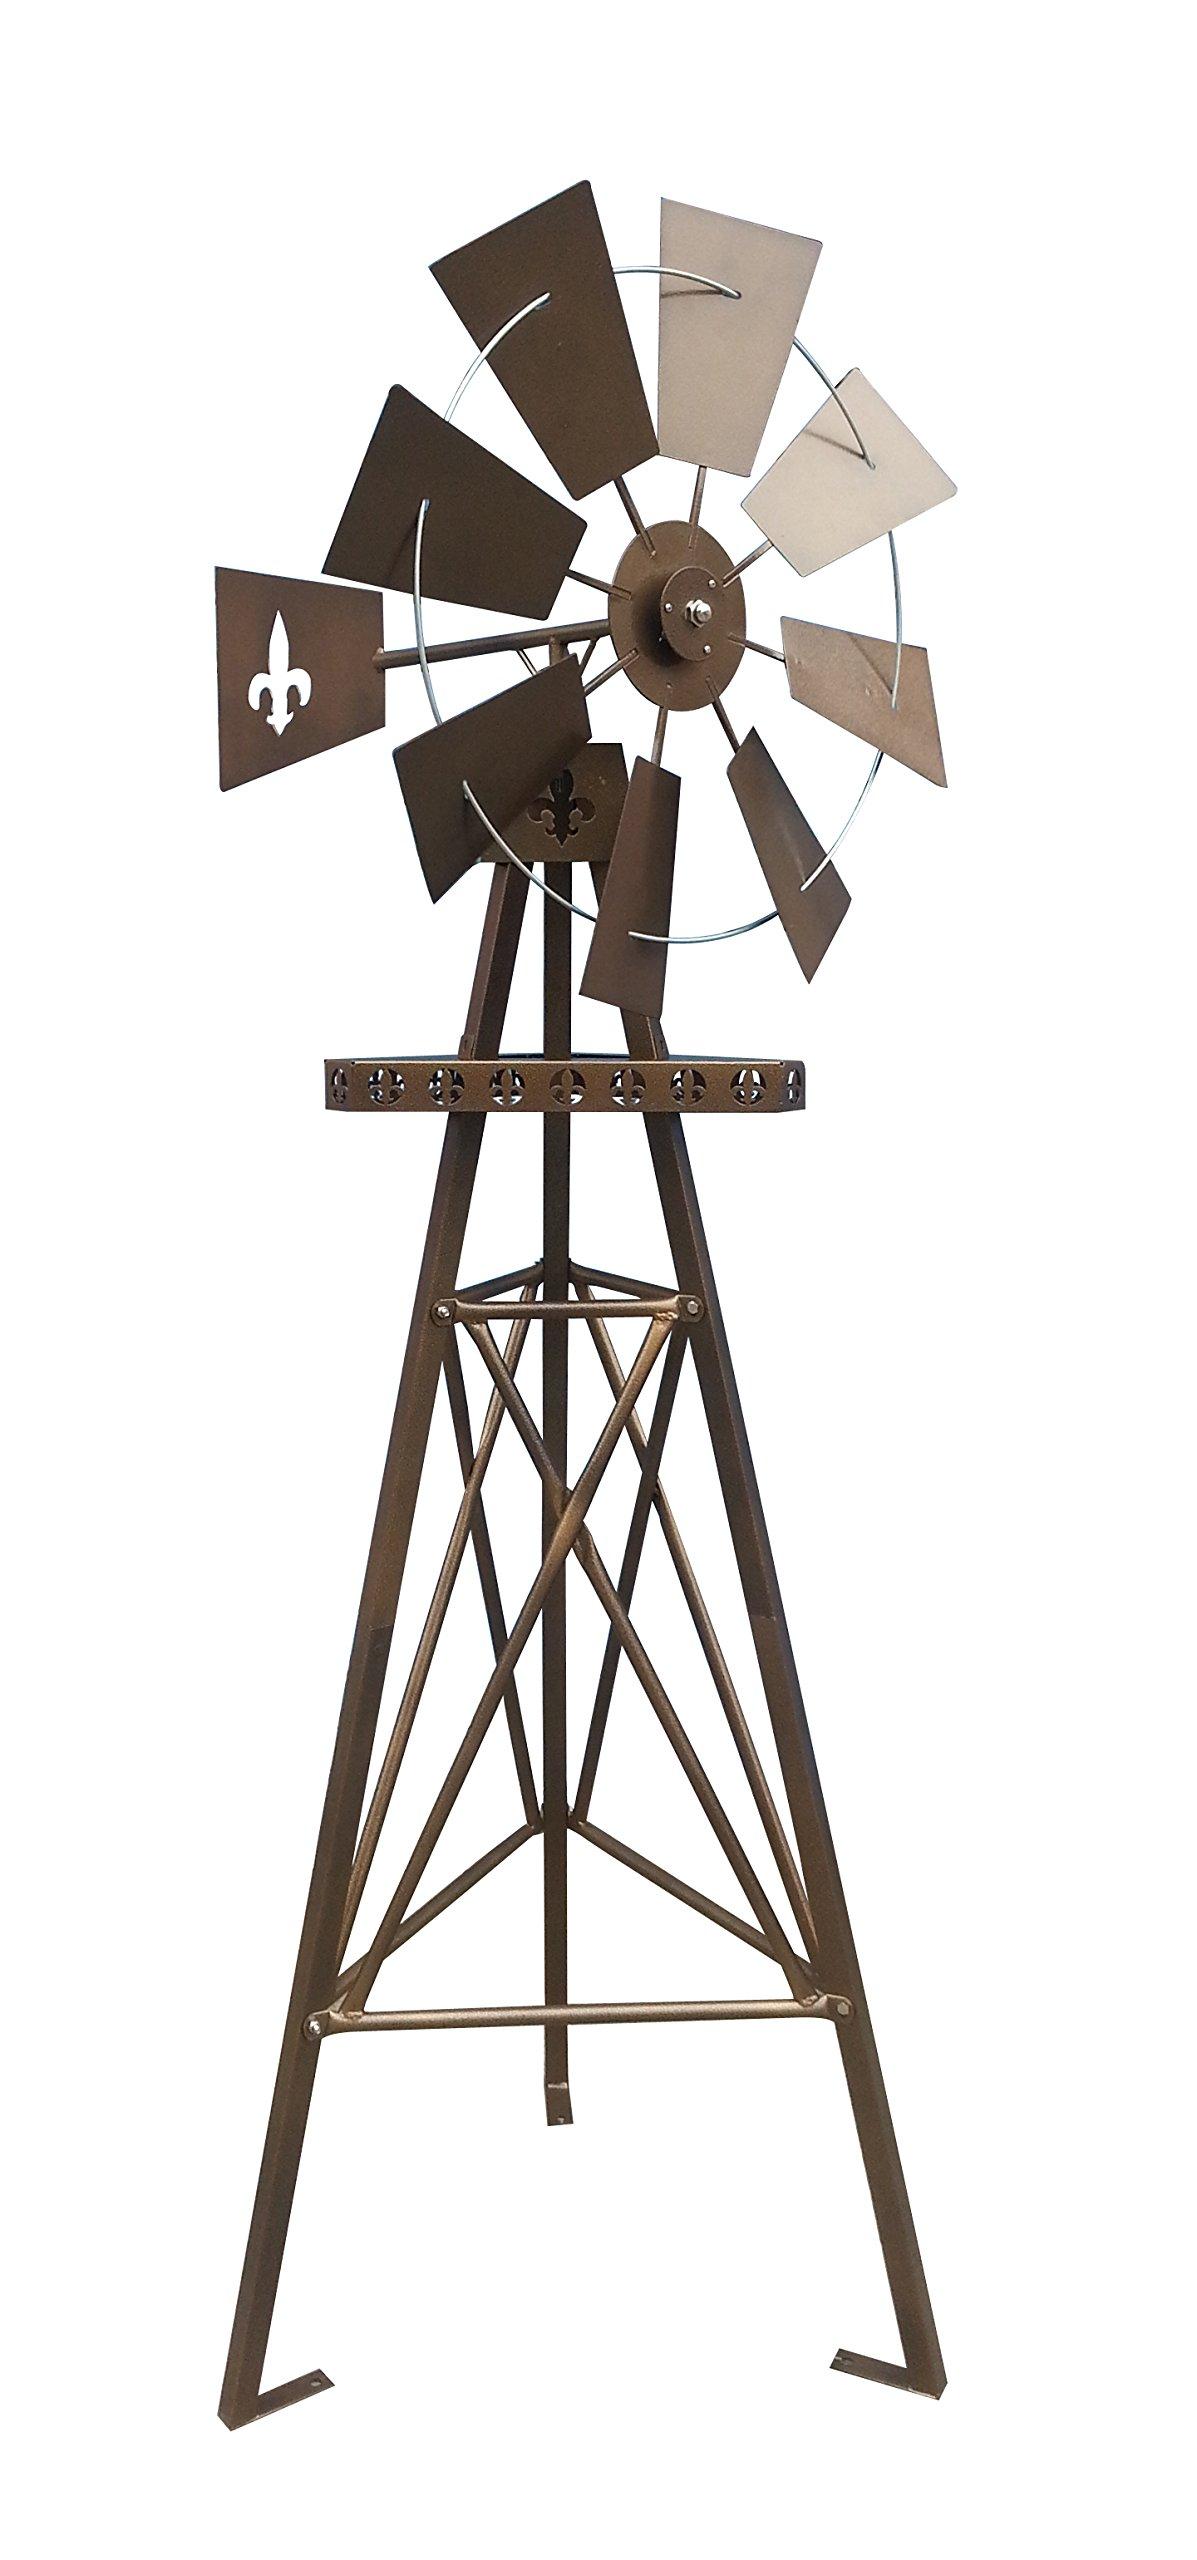 Leigh Country TX 93471 6' Rustic Tripod Fleur De Lis Metal Windmill